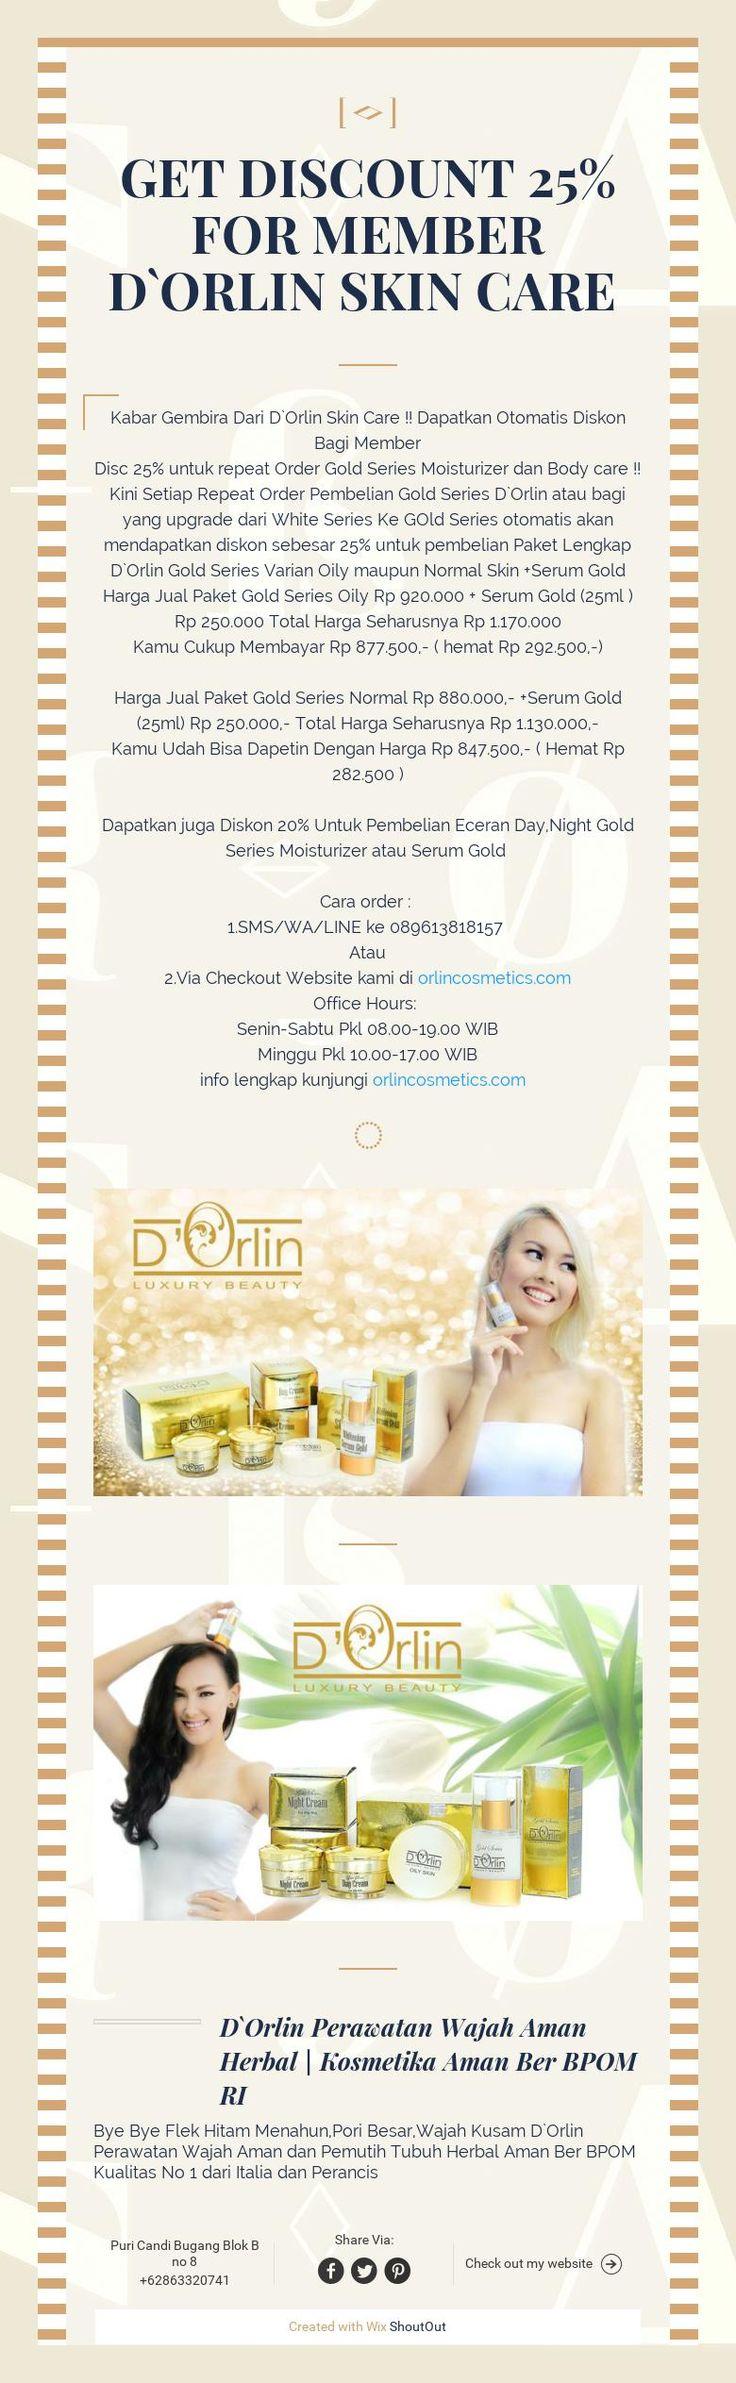 Get Discount 25% FoR MEMBER D`ORLIN SKIN CARE